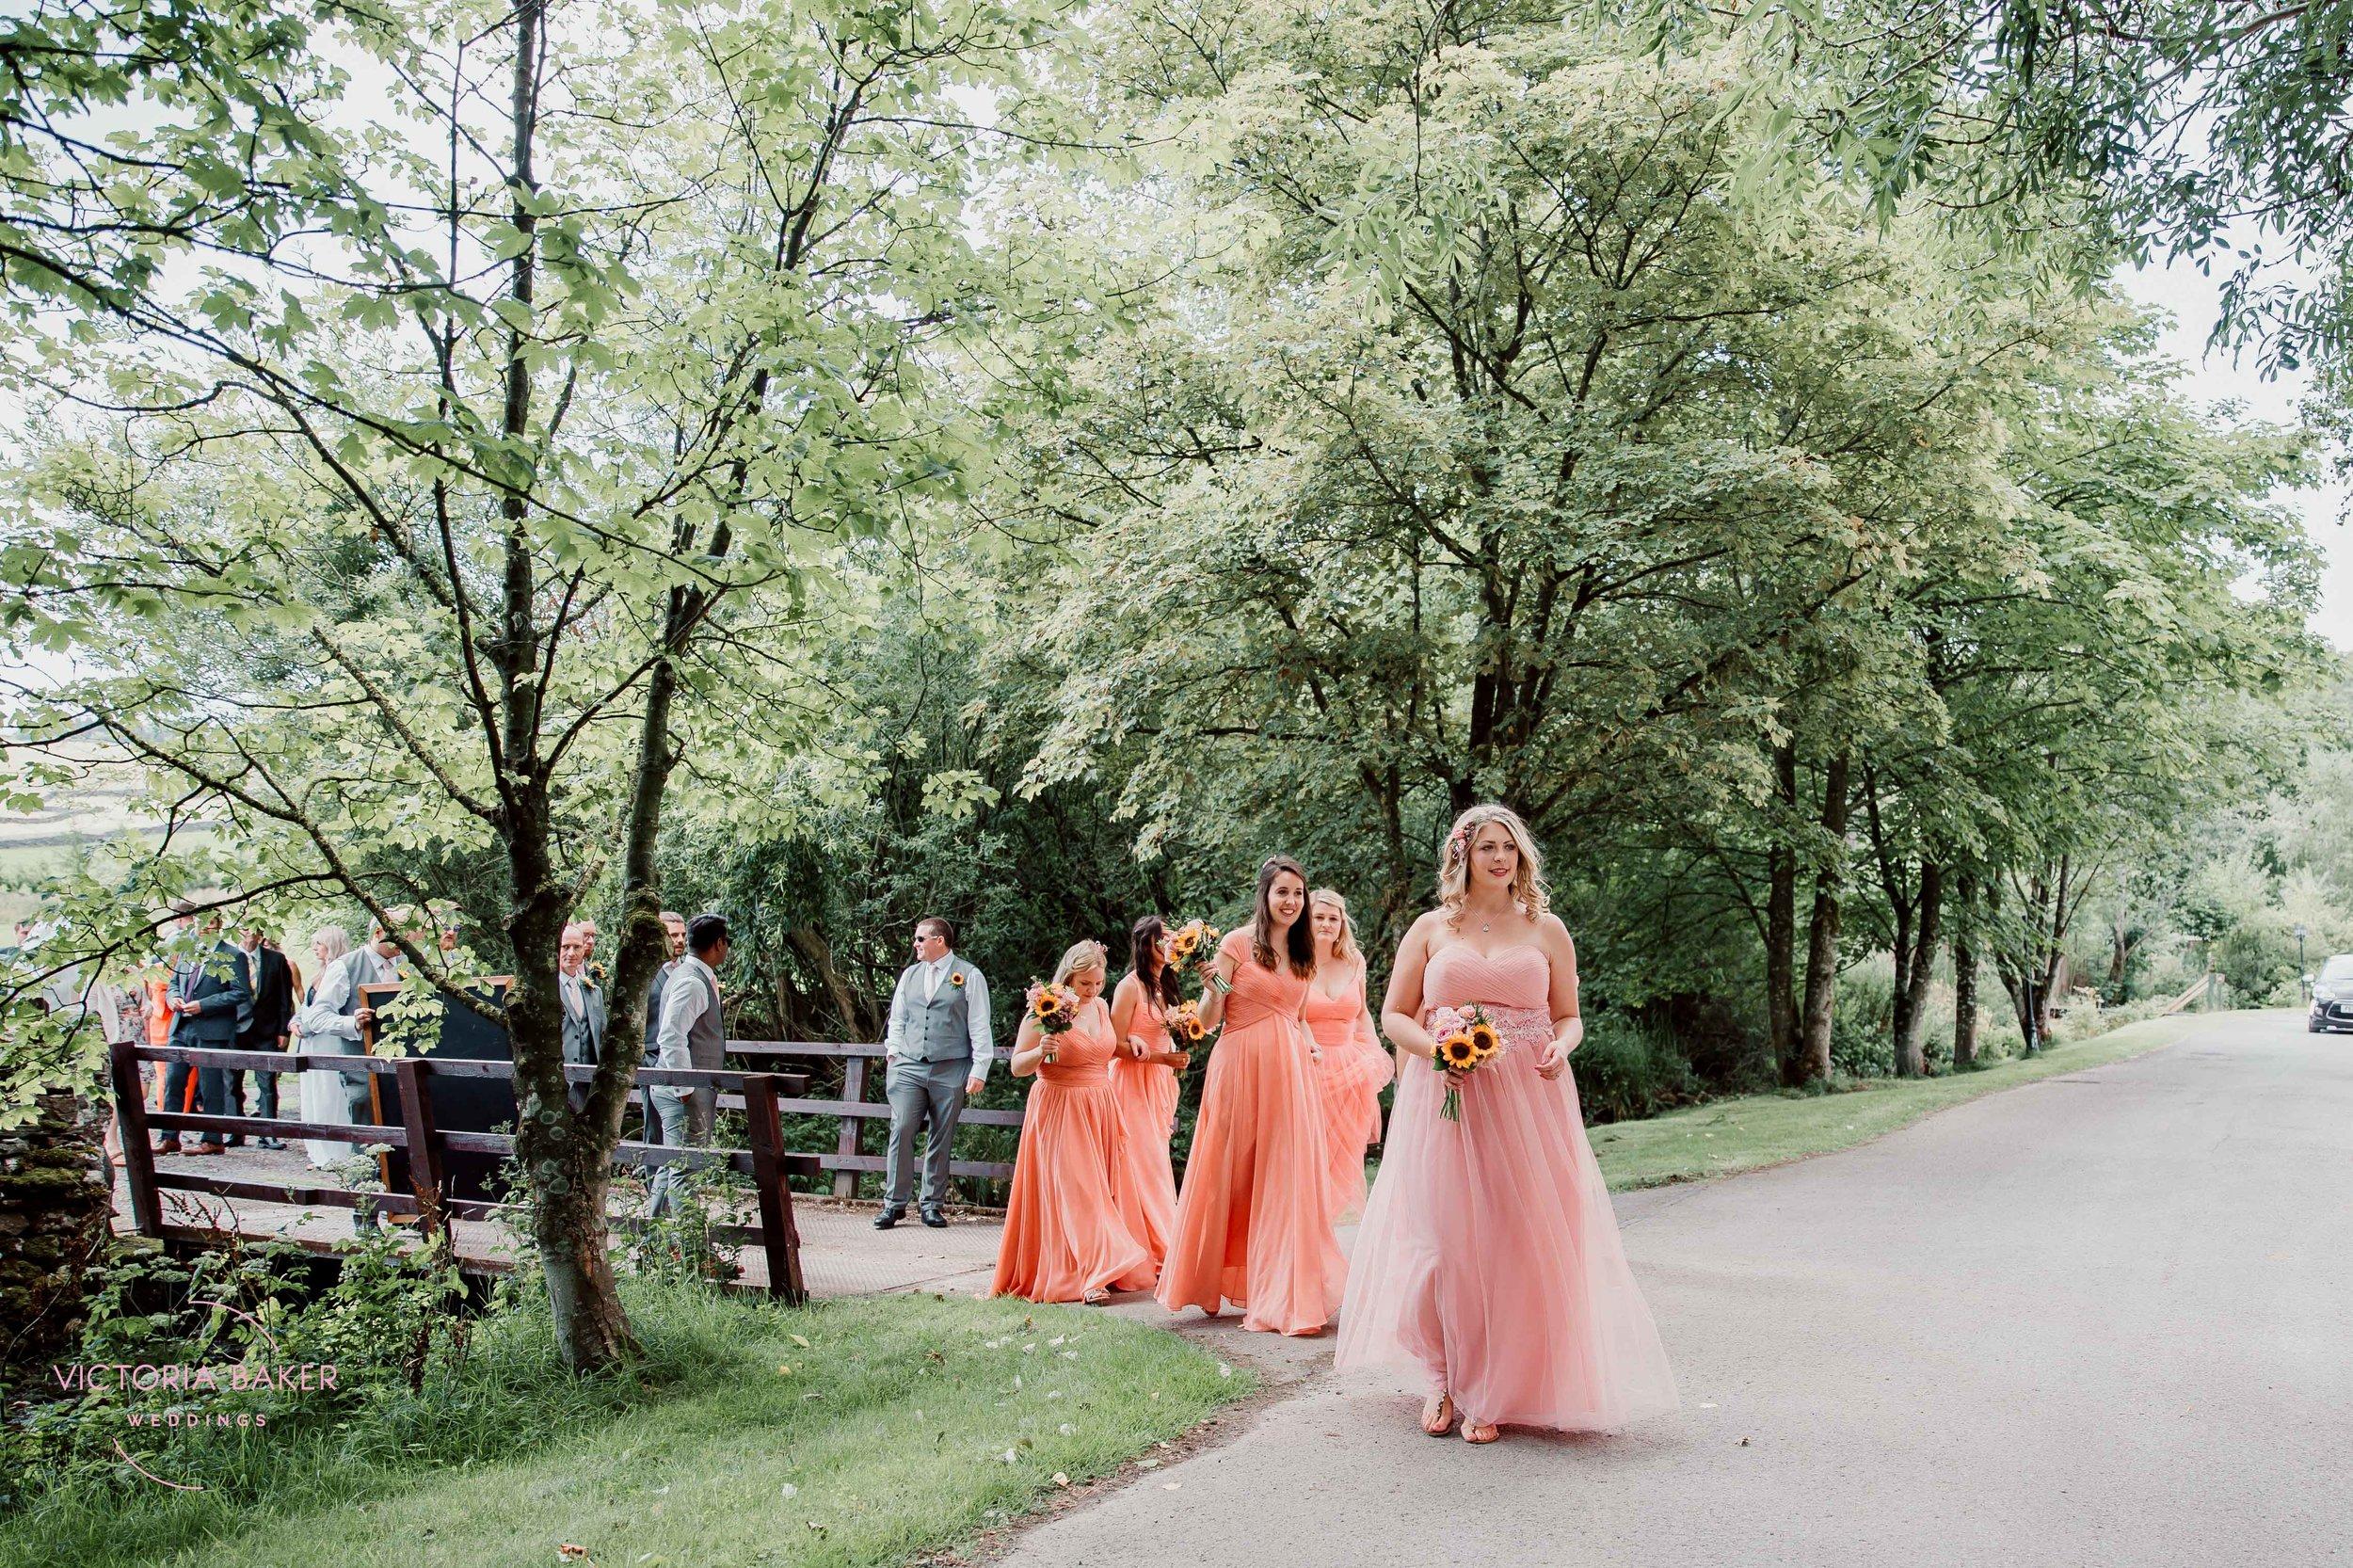 Wedding procession at Kilnsey Park Estate